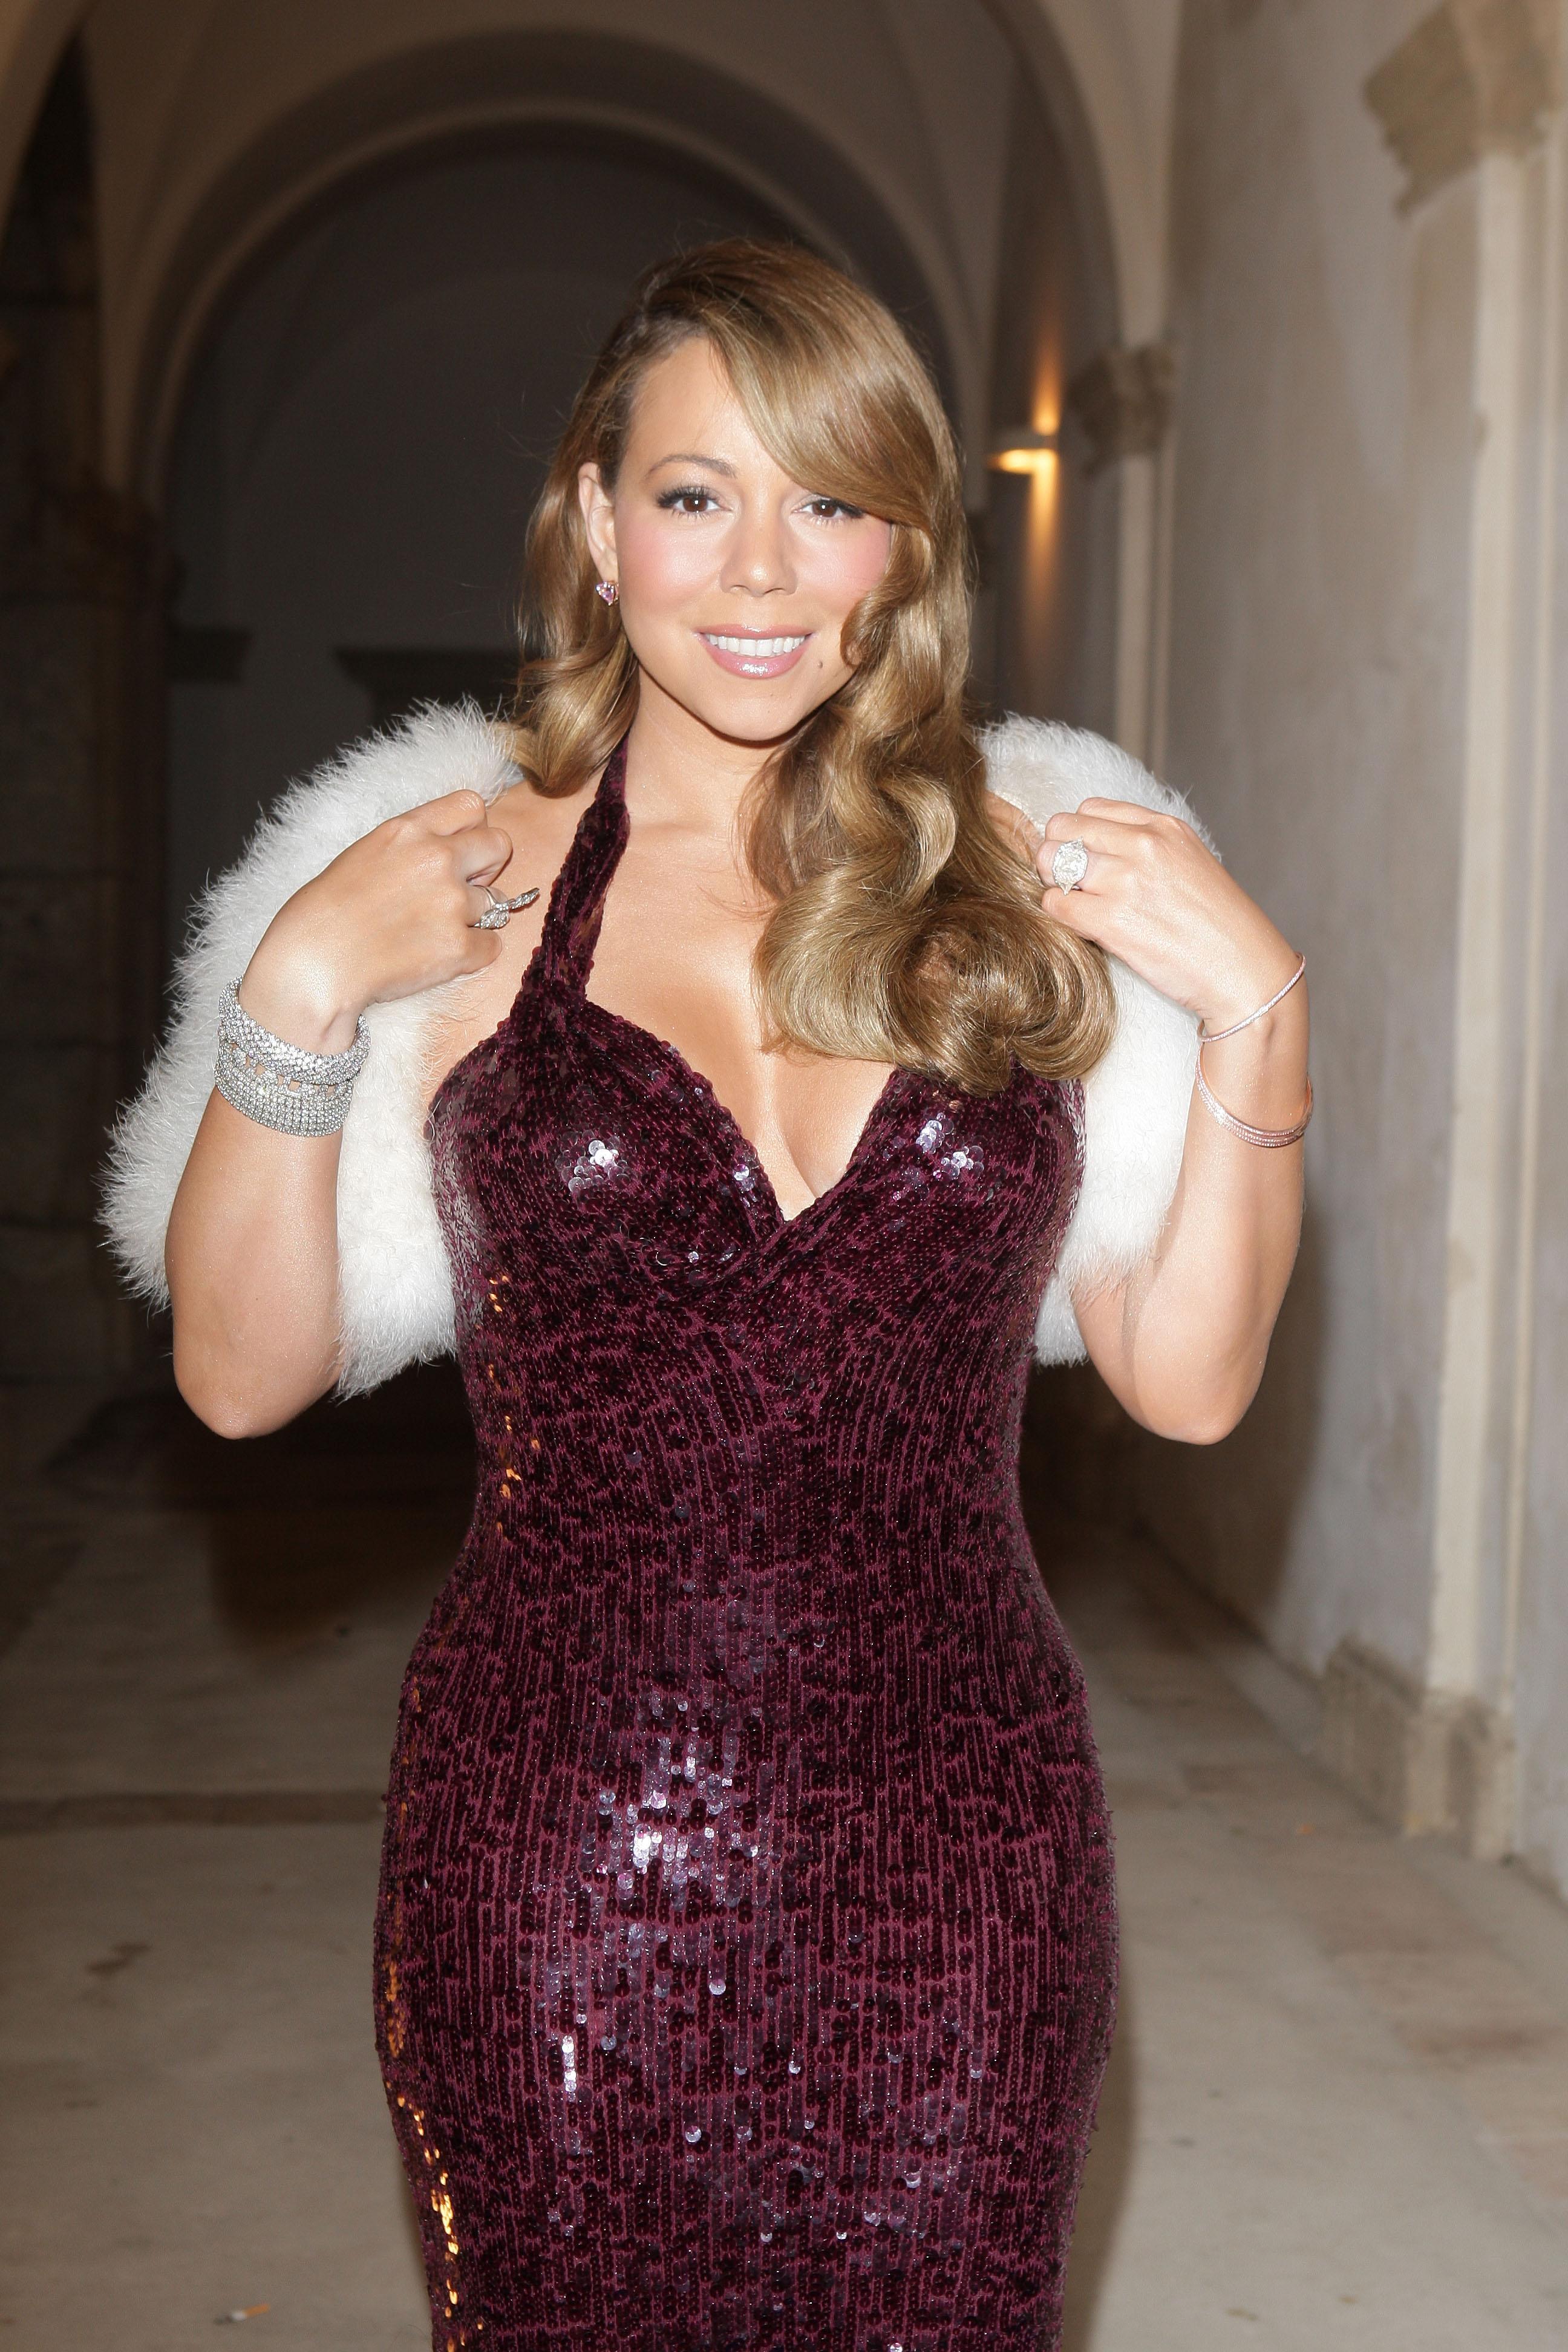 26824_Mariah_Carey_at_the_14th_Annual_Capri_Hollywood-6_122_393lo.jpg